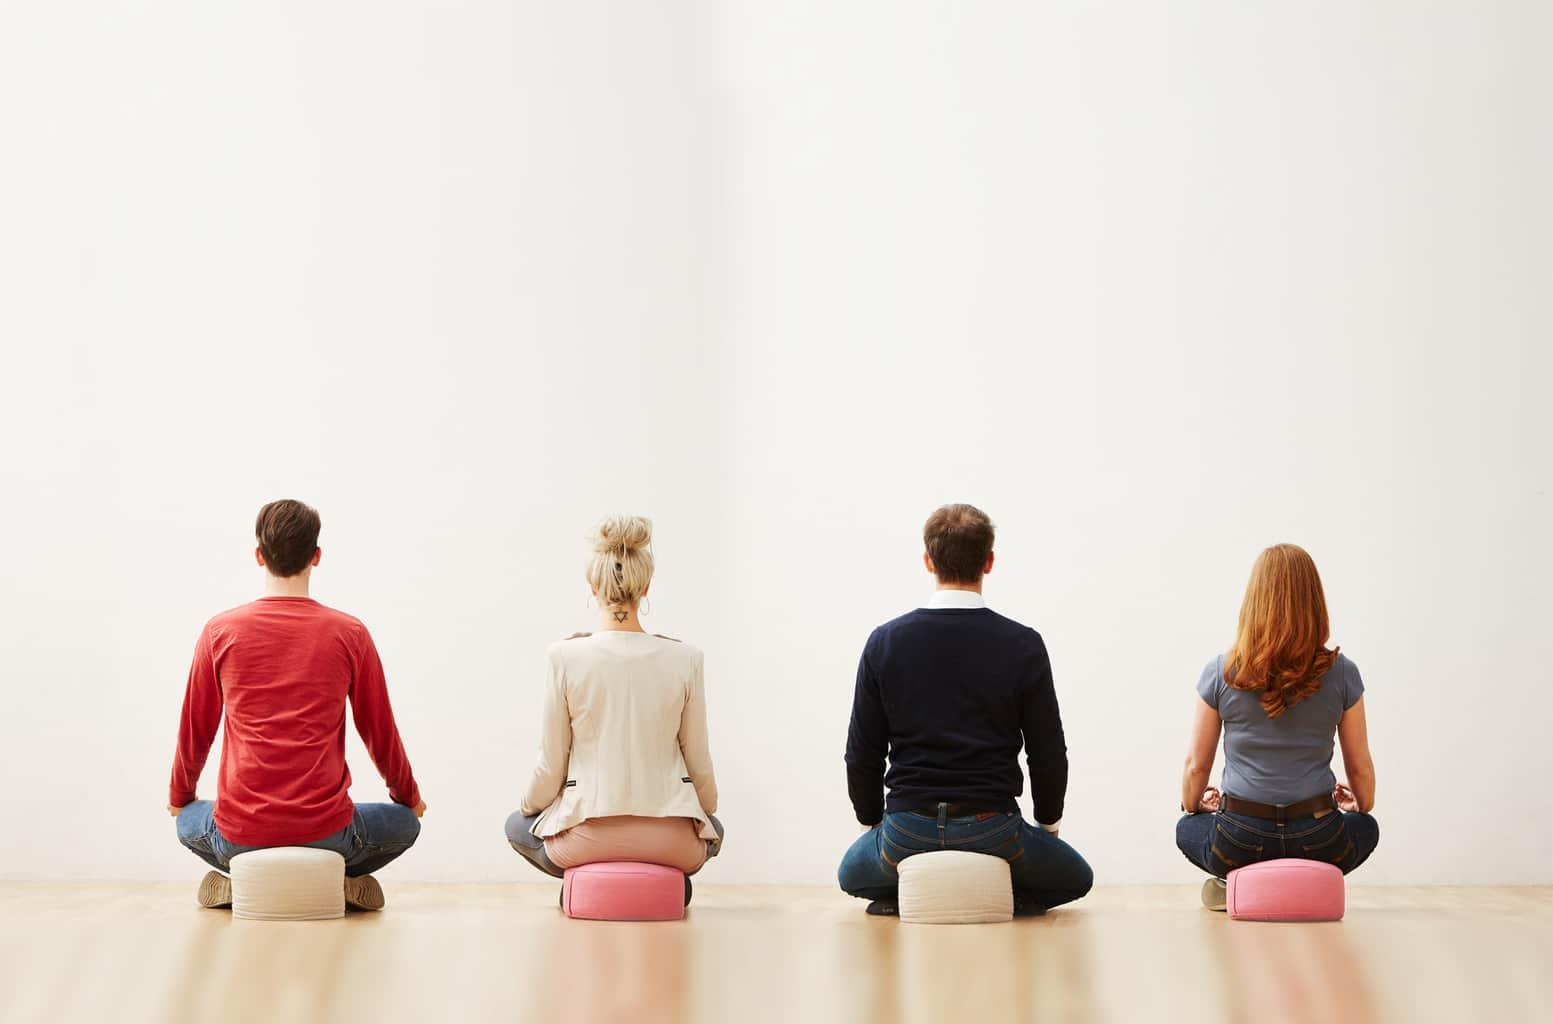 Übung zur Metta-Meditation